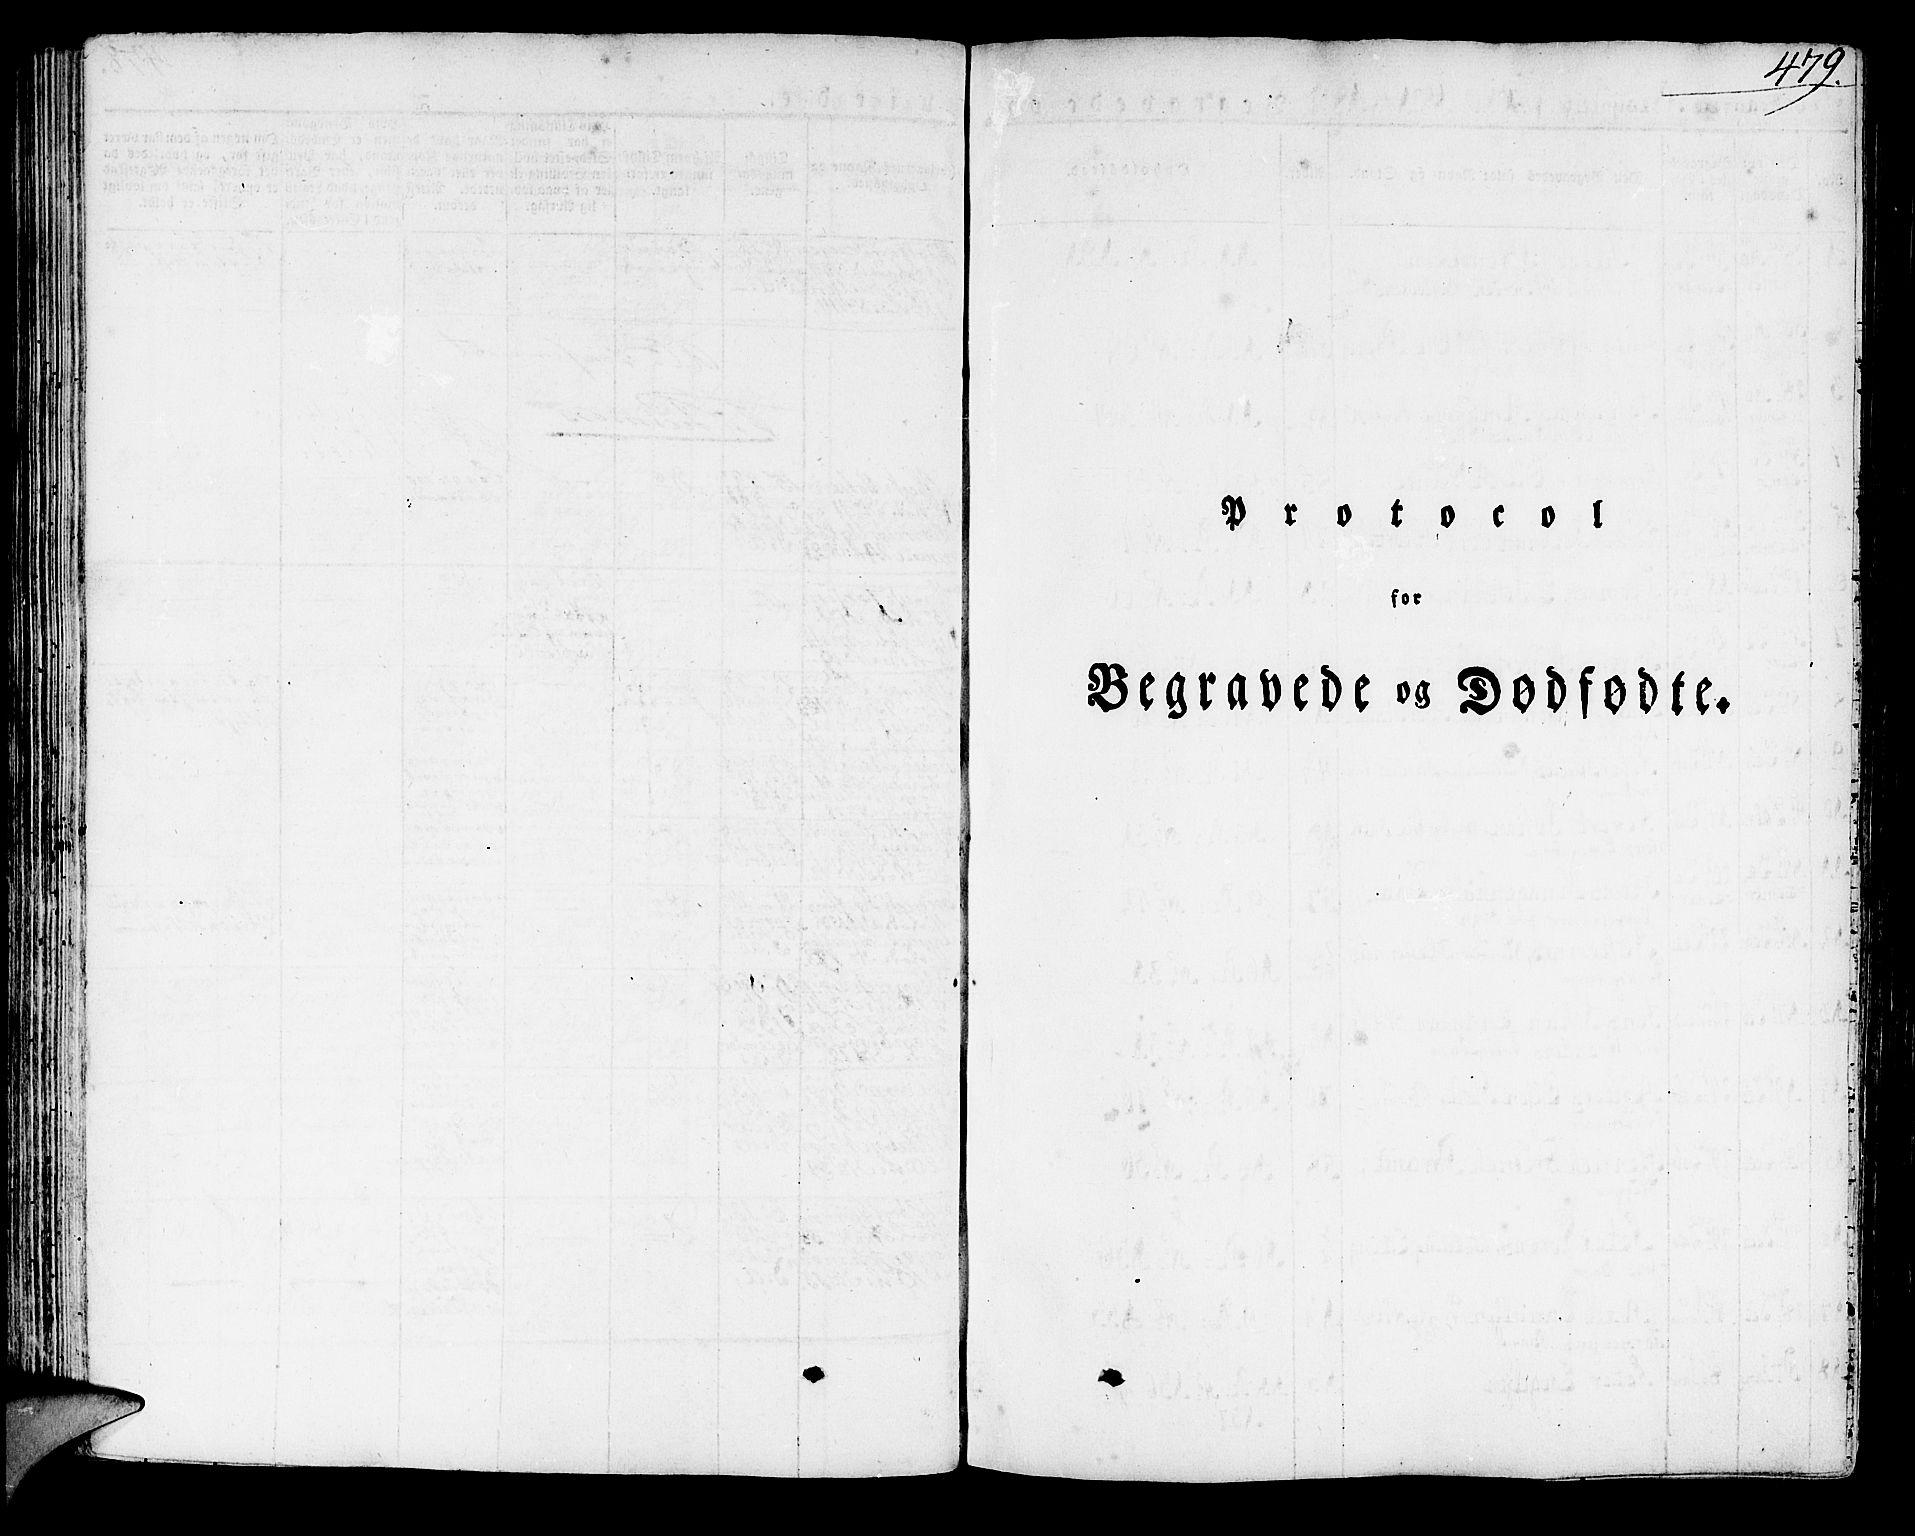 SAB, Domkirken Sokneprestembete, H/Haa/L0012: Ministerialbok nr. A 12, 1821-1840, s. 479